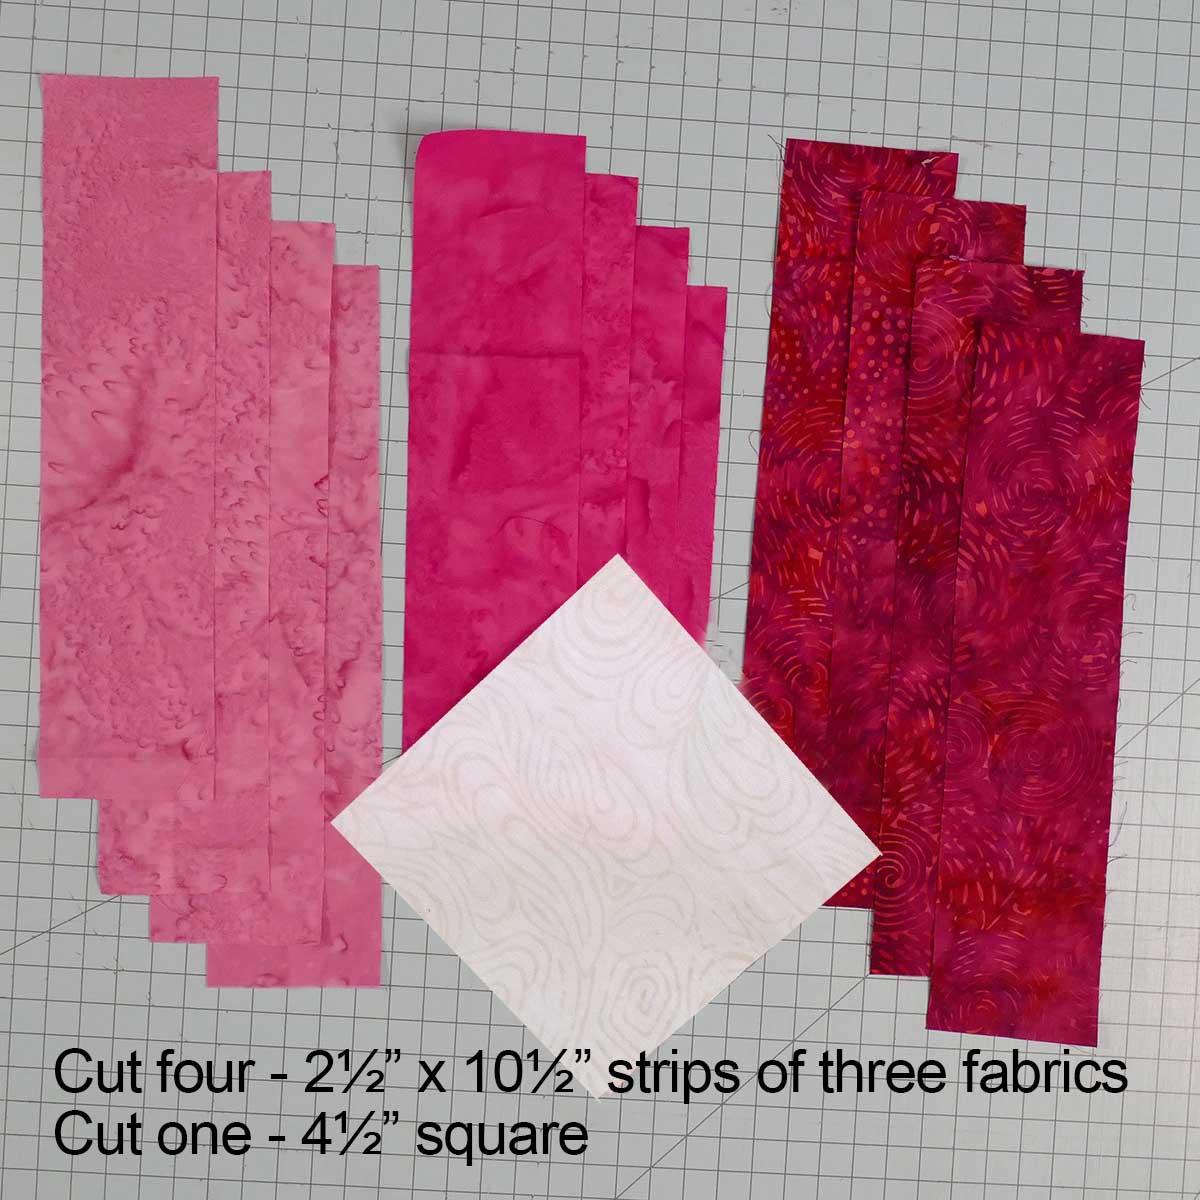 Rainbow Rail Fence fabric cuts